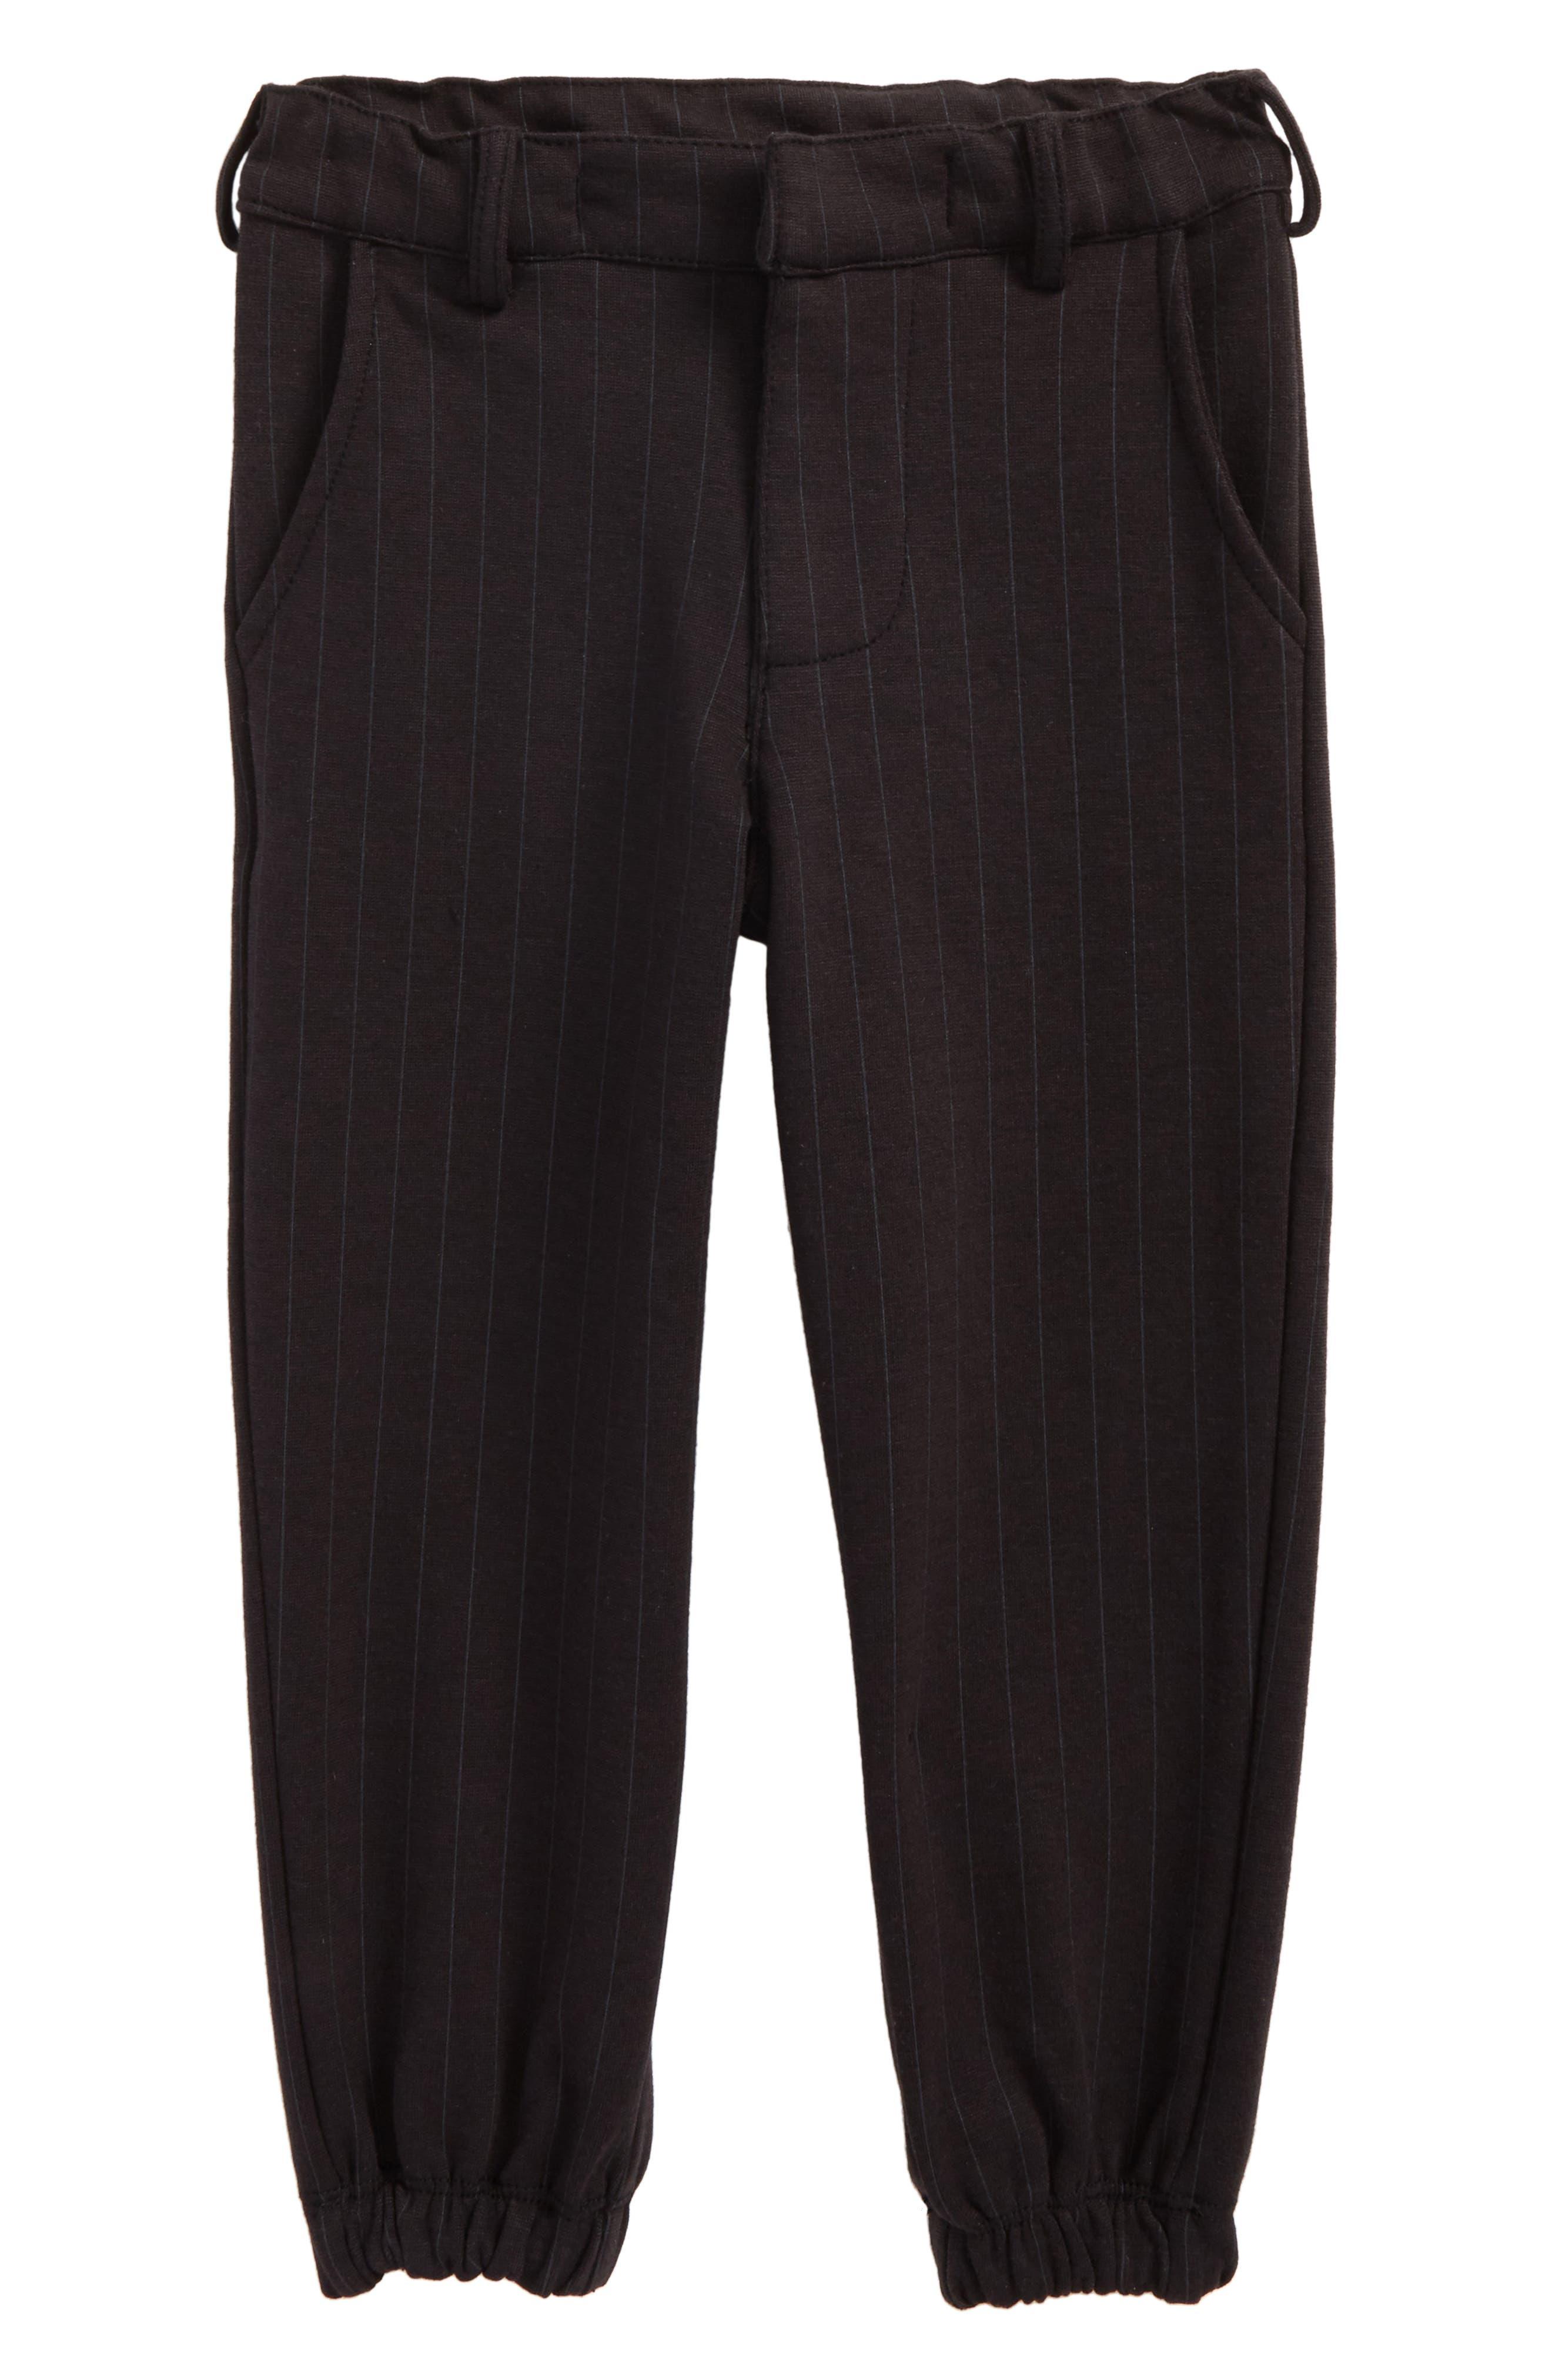 Pinstripe Jogger Pants,                             Main thumbnail 1, color,                             Black